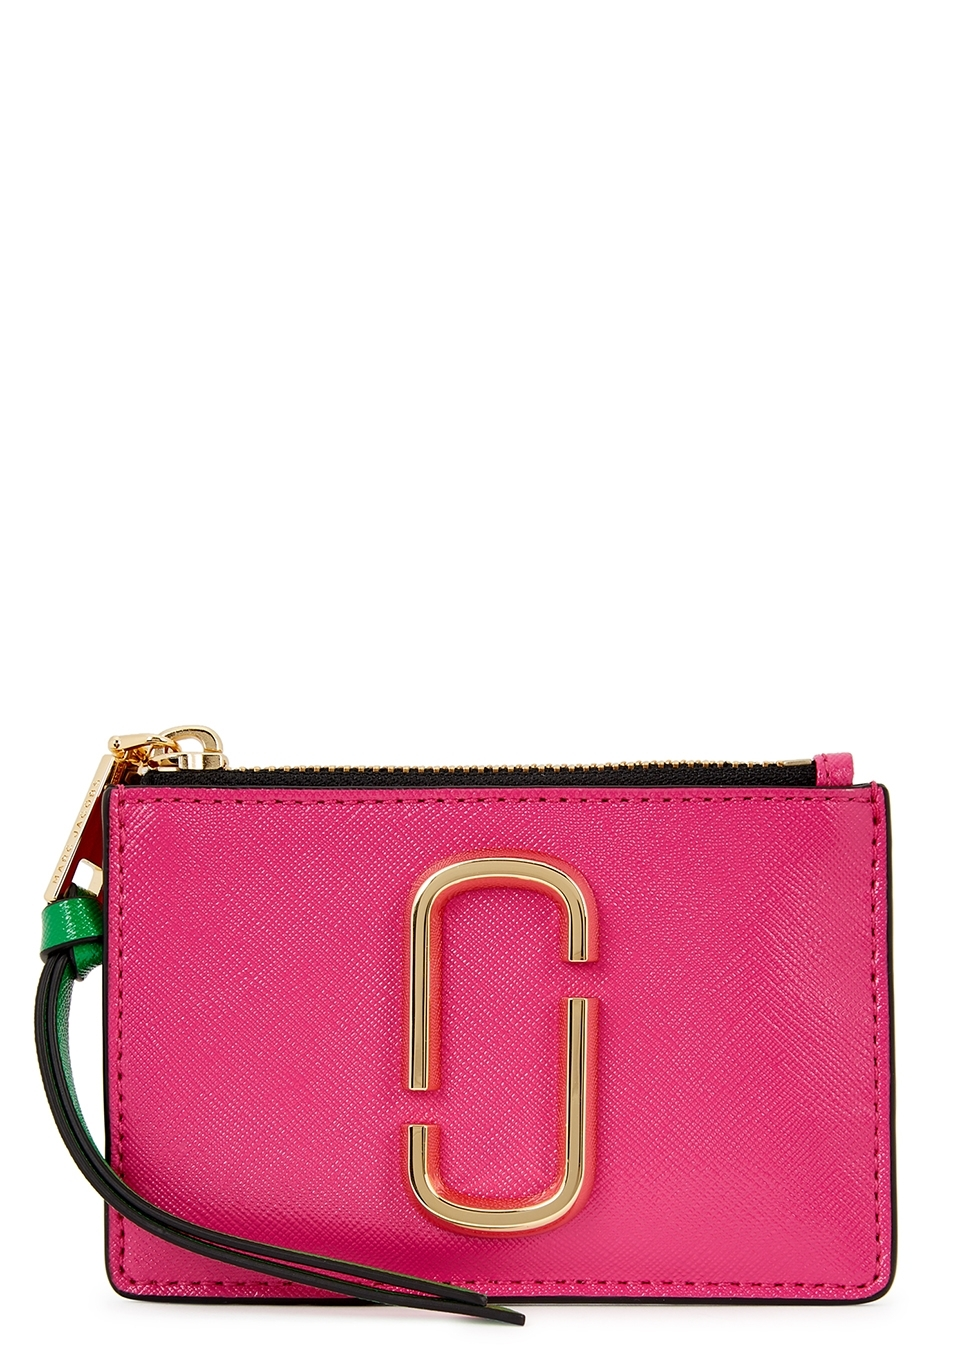 48b01543f26197 Women's Designer Purses and Wallets - Harvey Nichols